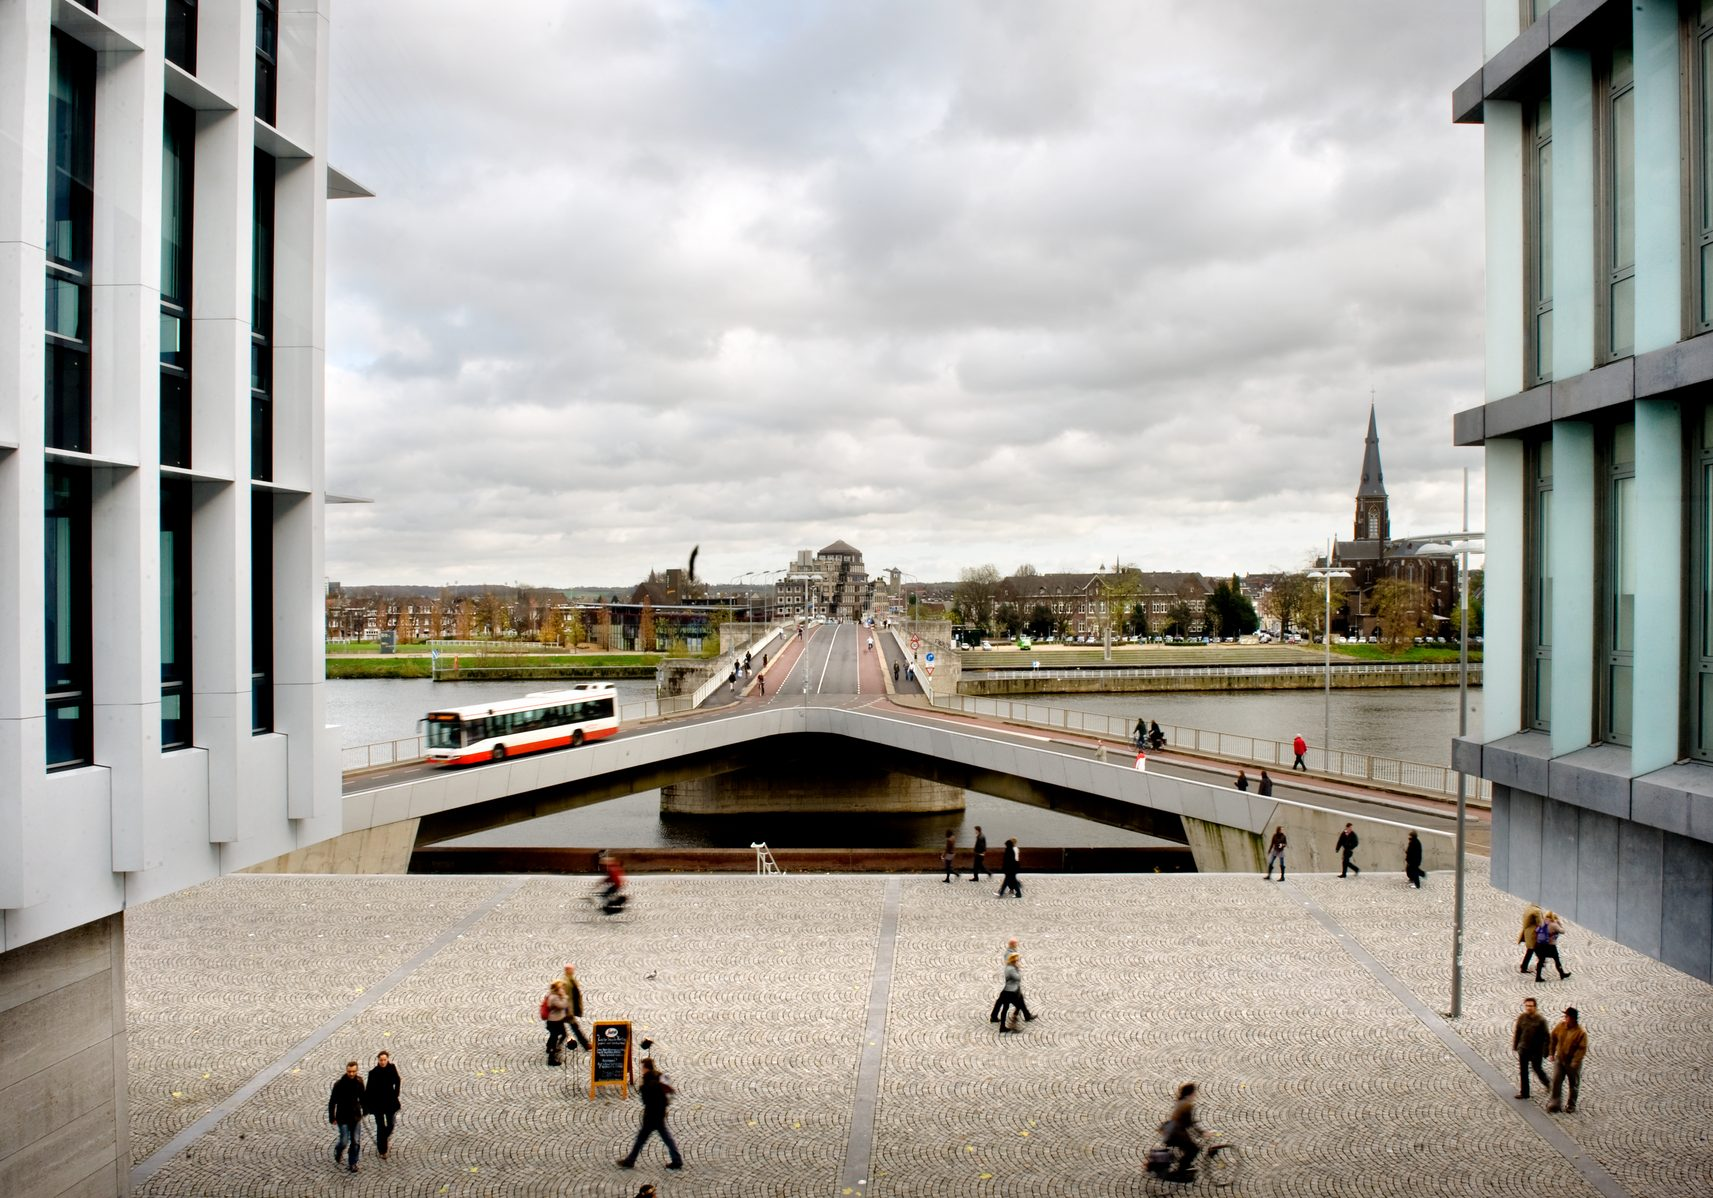 Maastricht Marketing/Hugo Thomassen